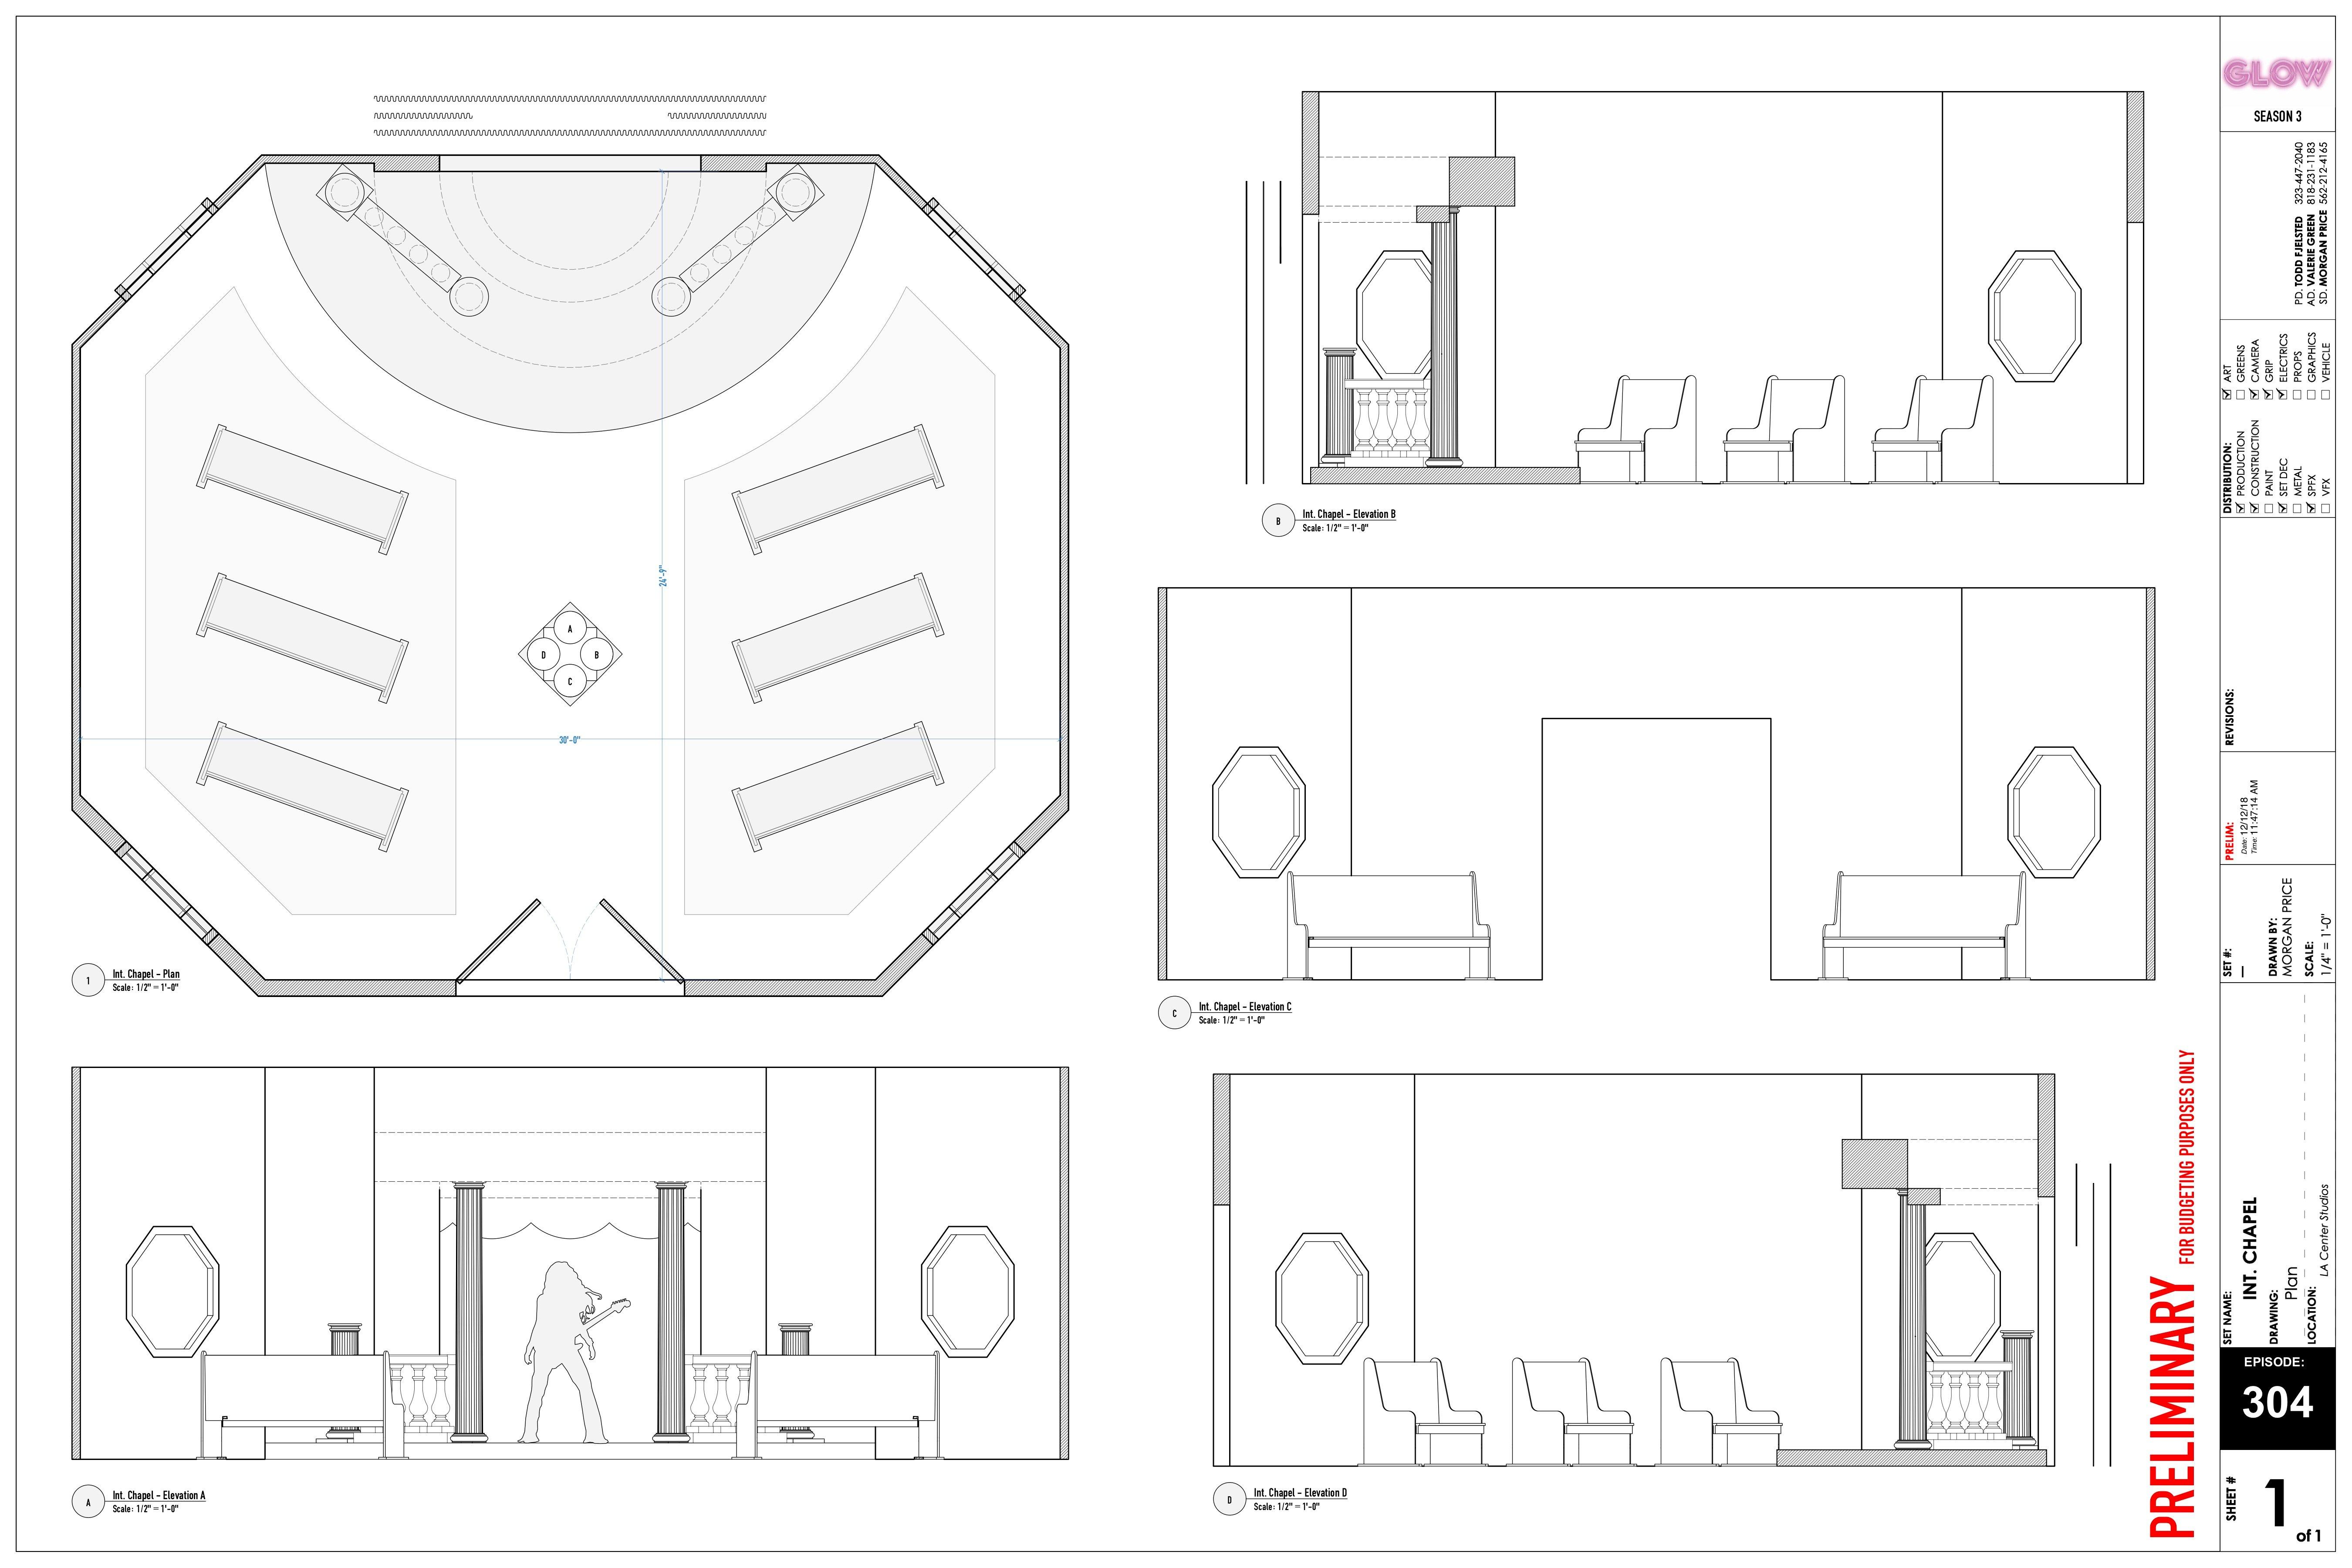 GLOW S3 - Ep. 303 - Int. Chapel